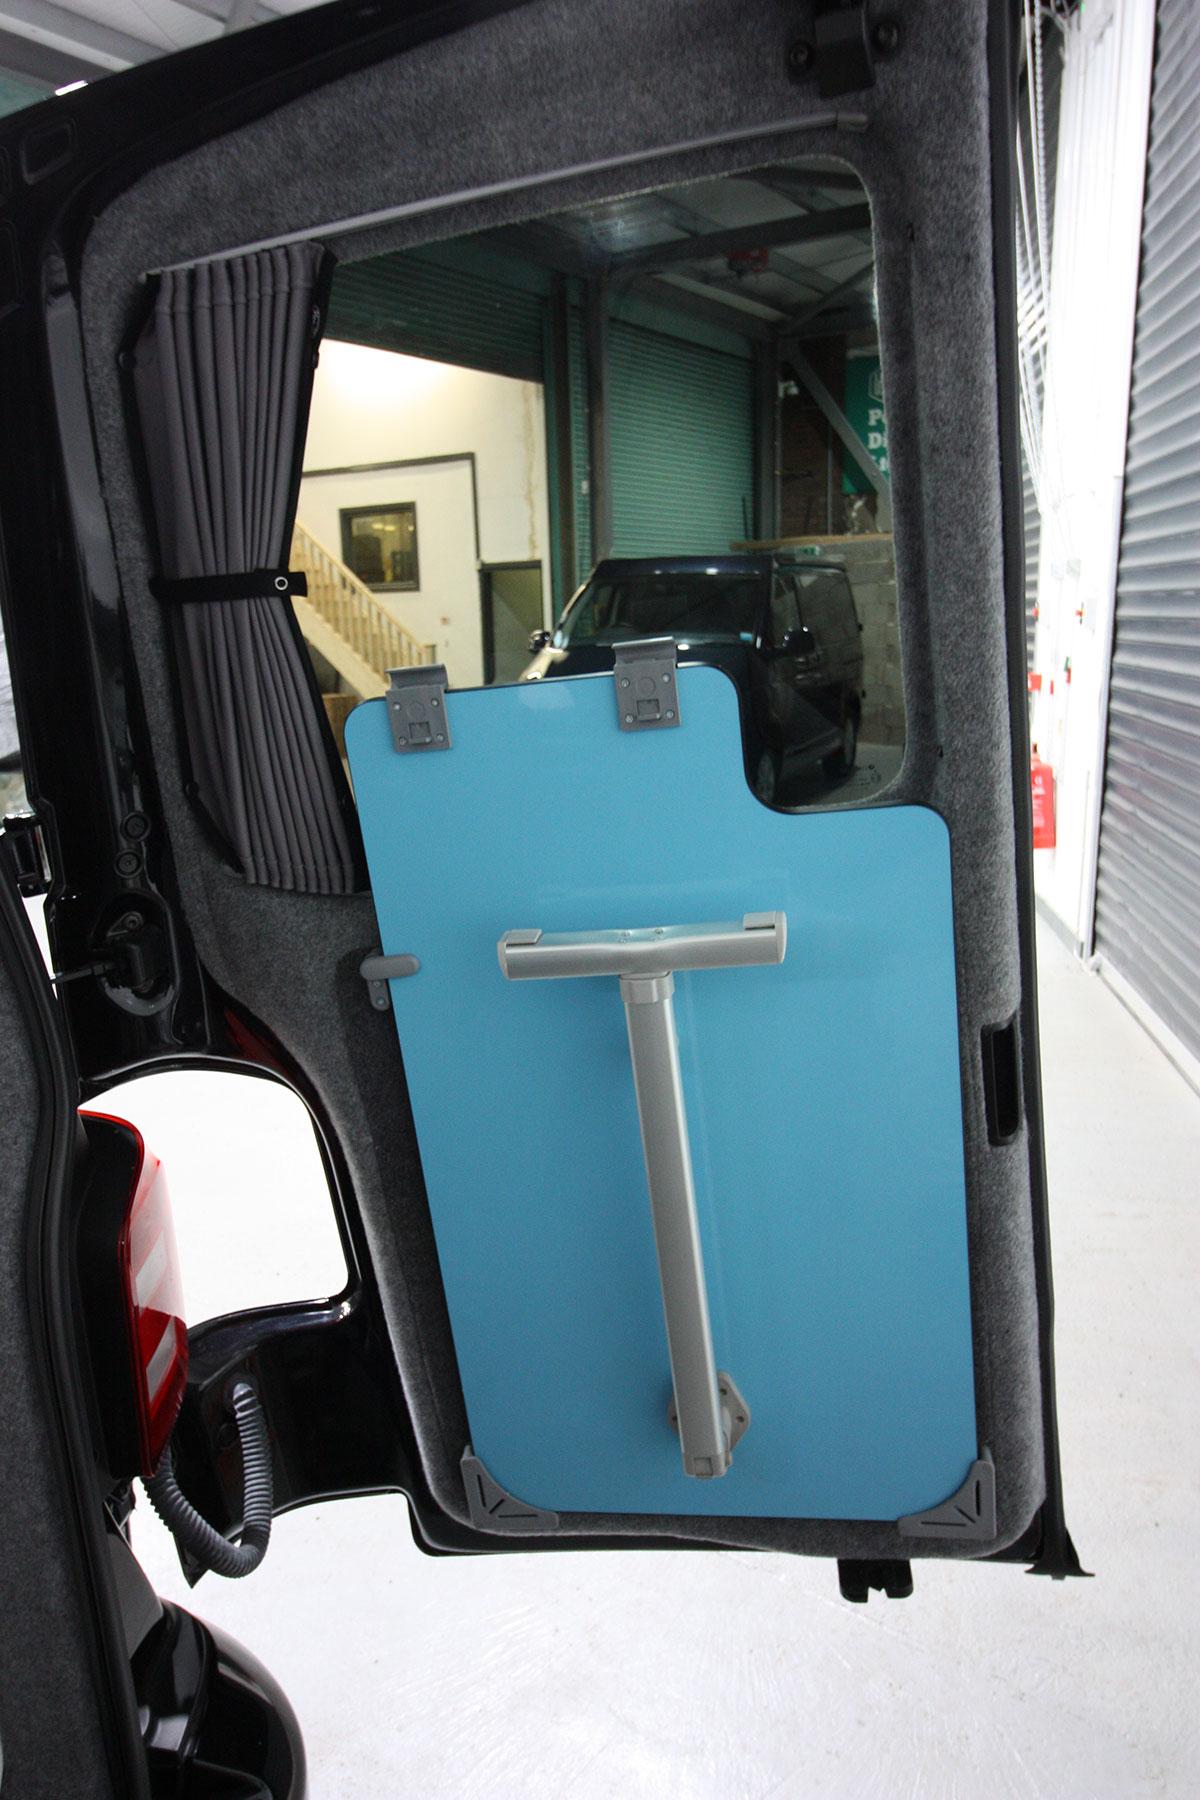 Volkswagen Transporter T6 SWB T28 Trendline 102ps Manual 2016 New Campervan Conversion